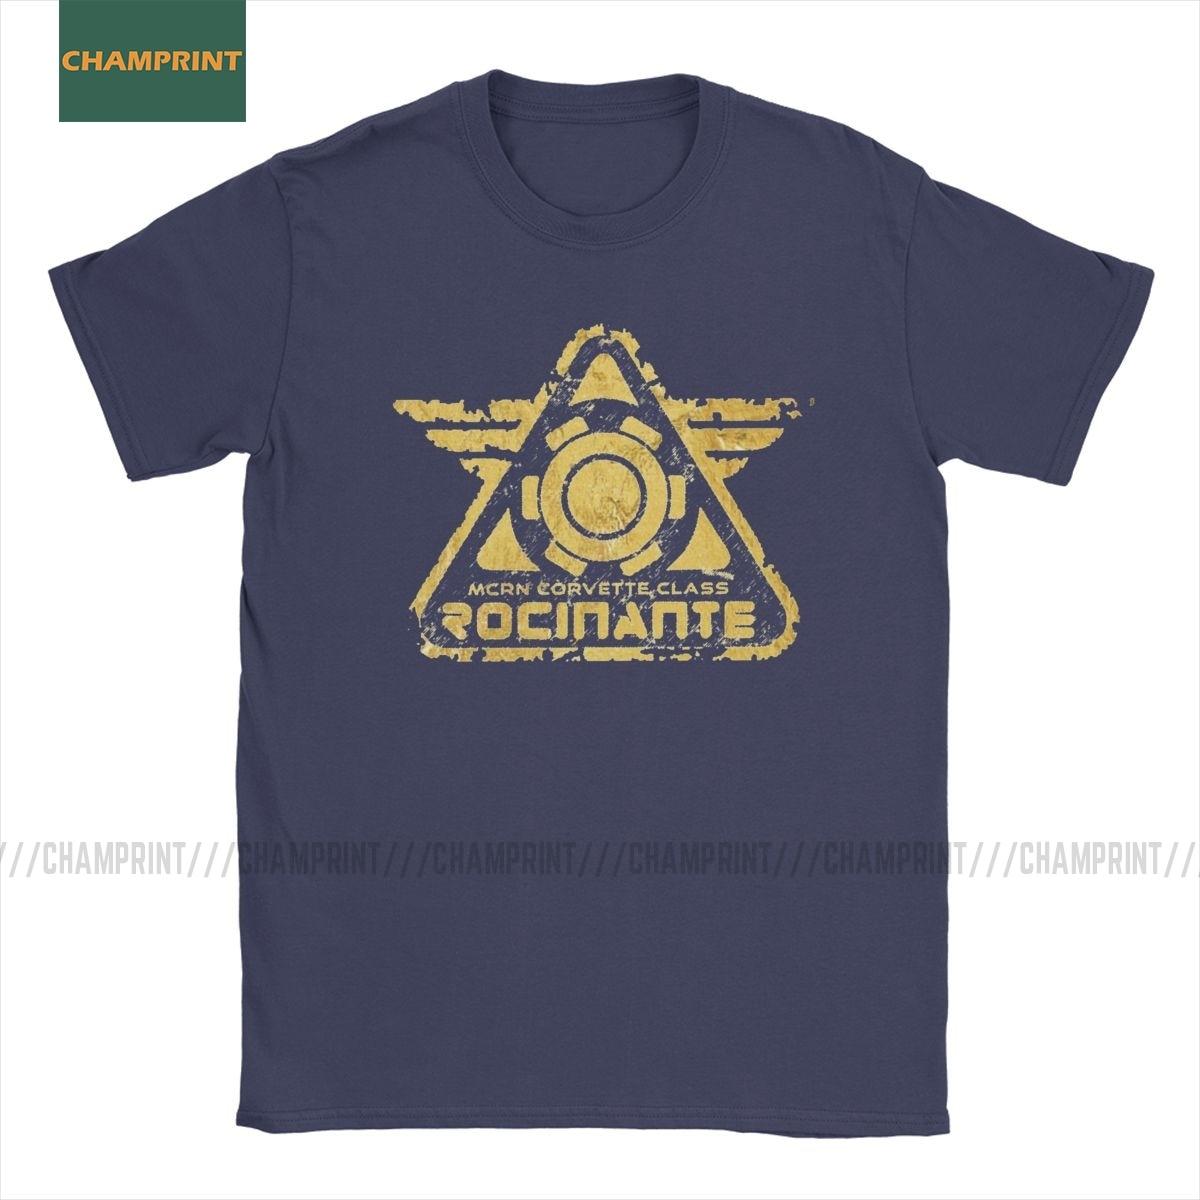 Mcrn Rocinanti The Expanse футболка для мужчин из чистого хлопка футболки Sci-fi ТВ серии Science fiction футболки с коротким рукавом топы